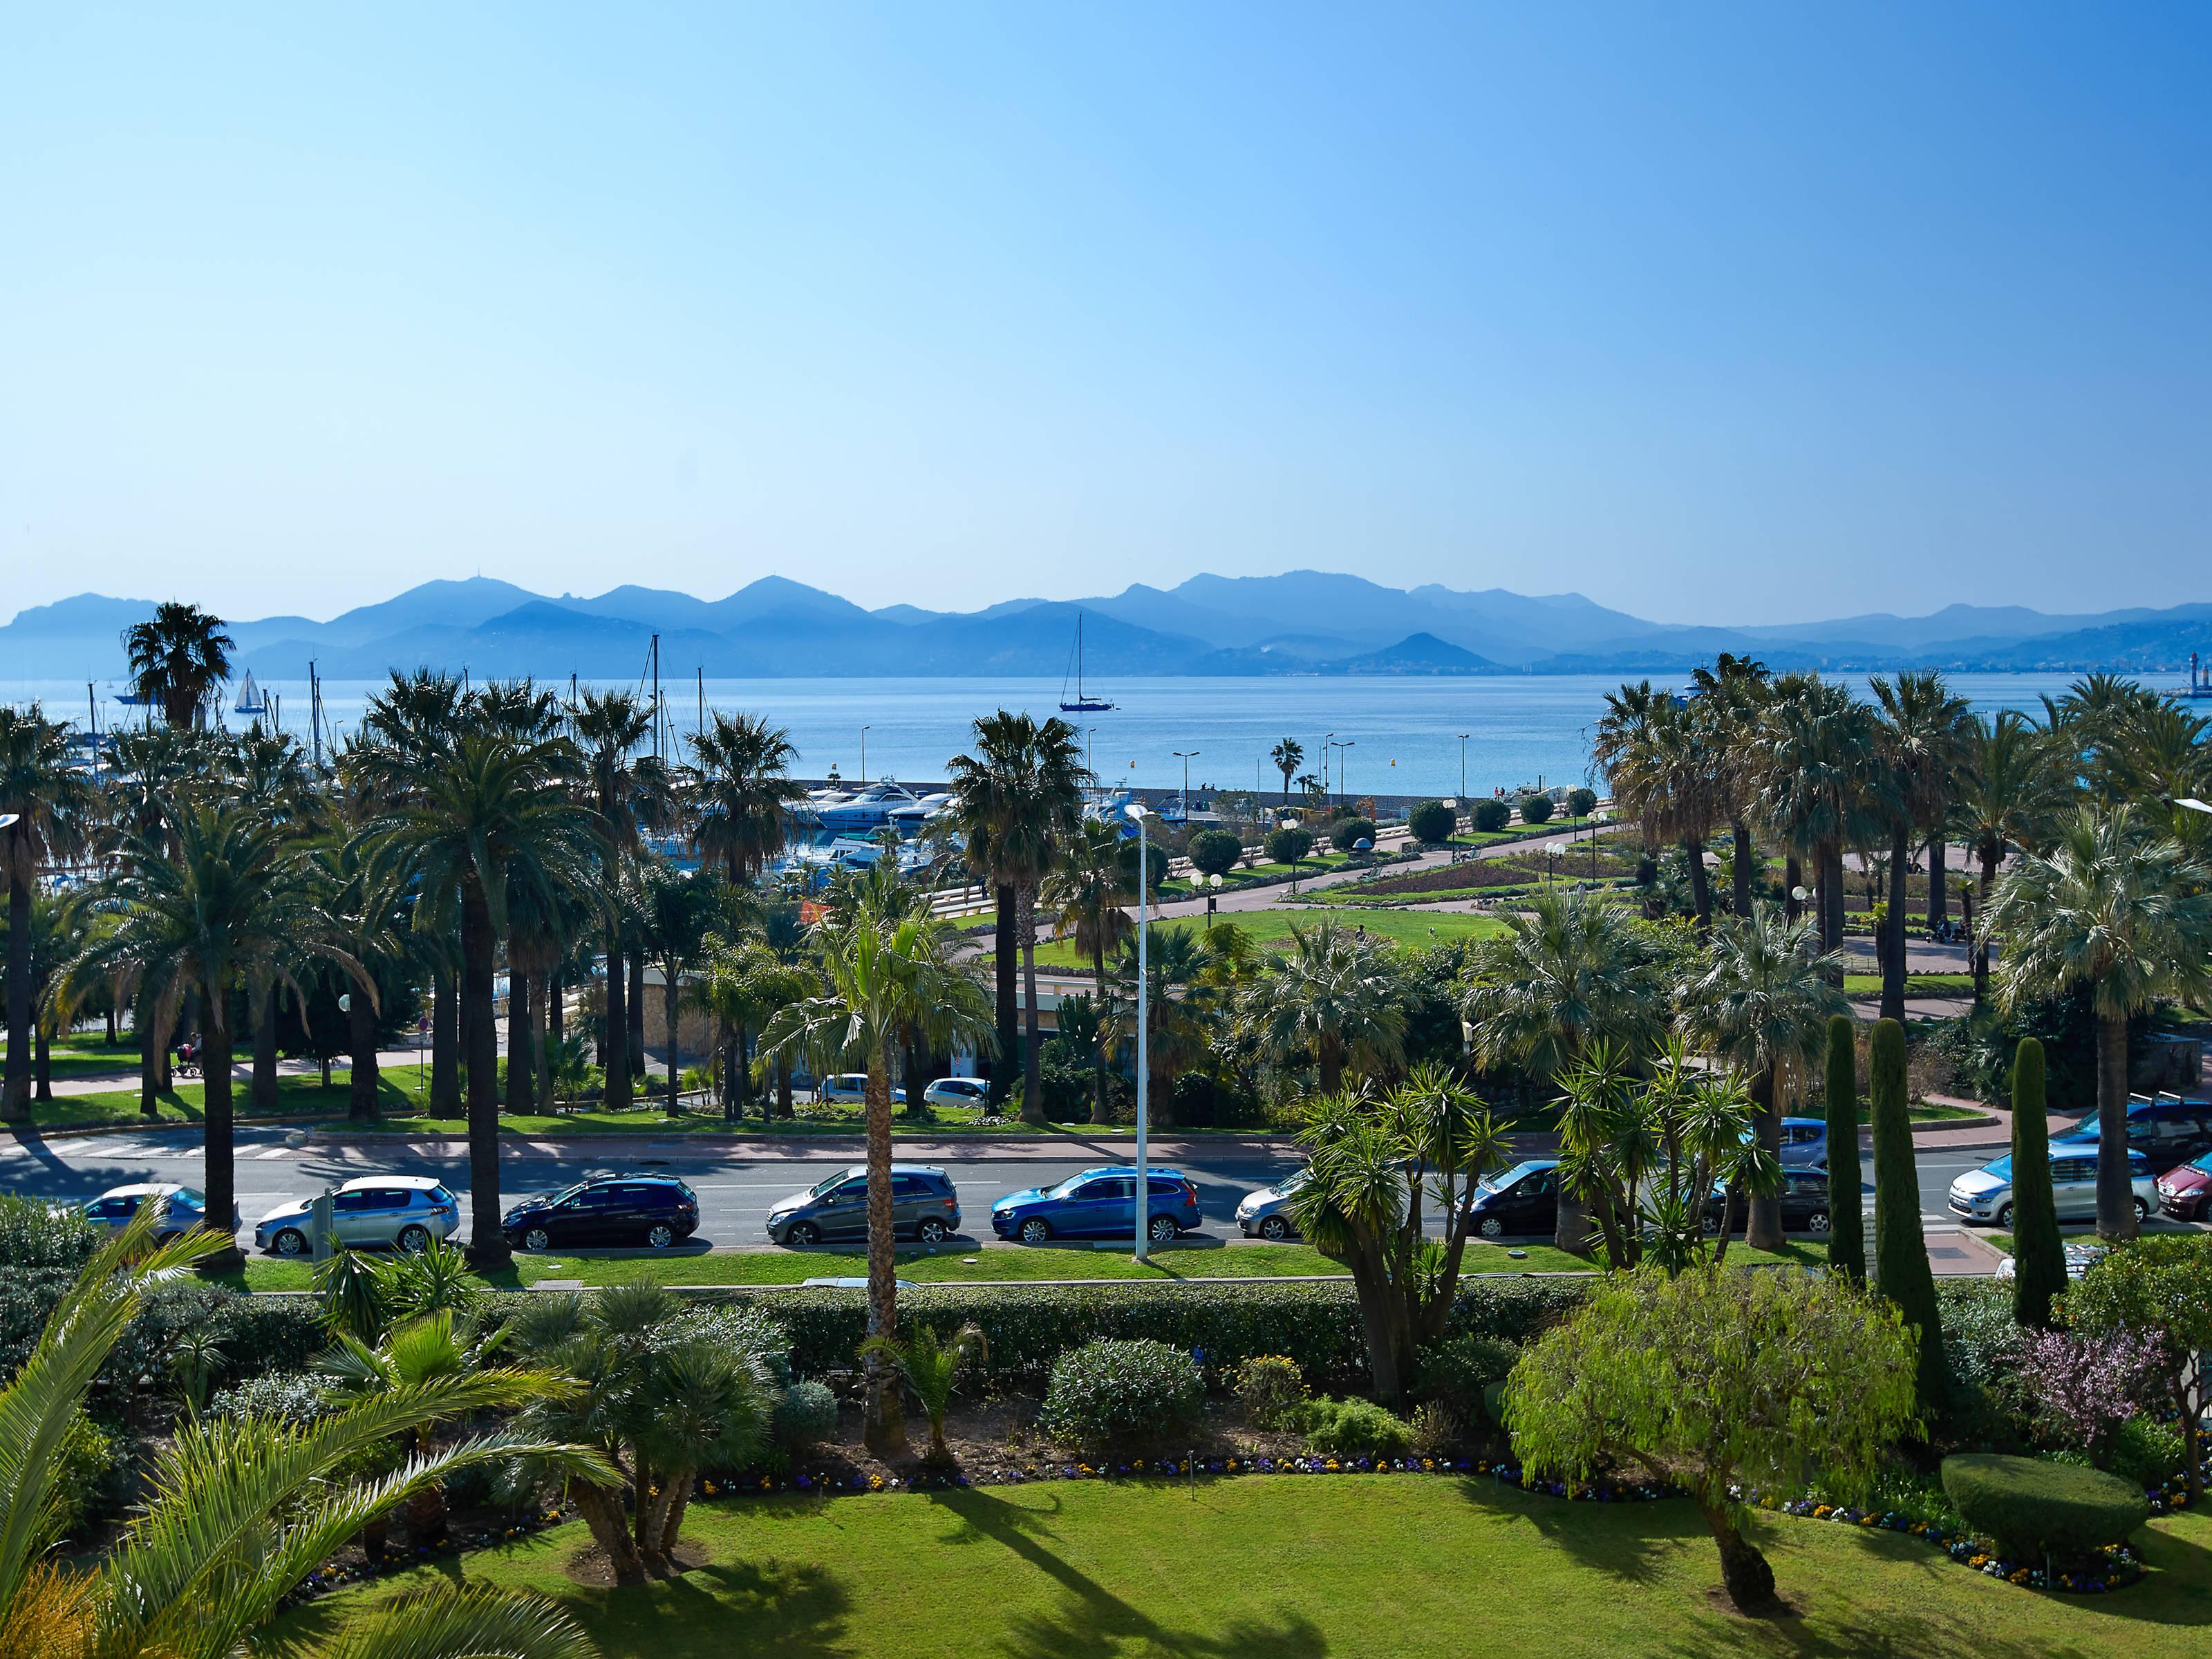 Apartamento por un Venta en Cannes Croisette - 3 bedroom apartment with panoramic sea view Cannes, Provincia - Alpes - Costa Azul 06400 Francia